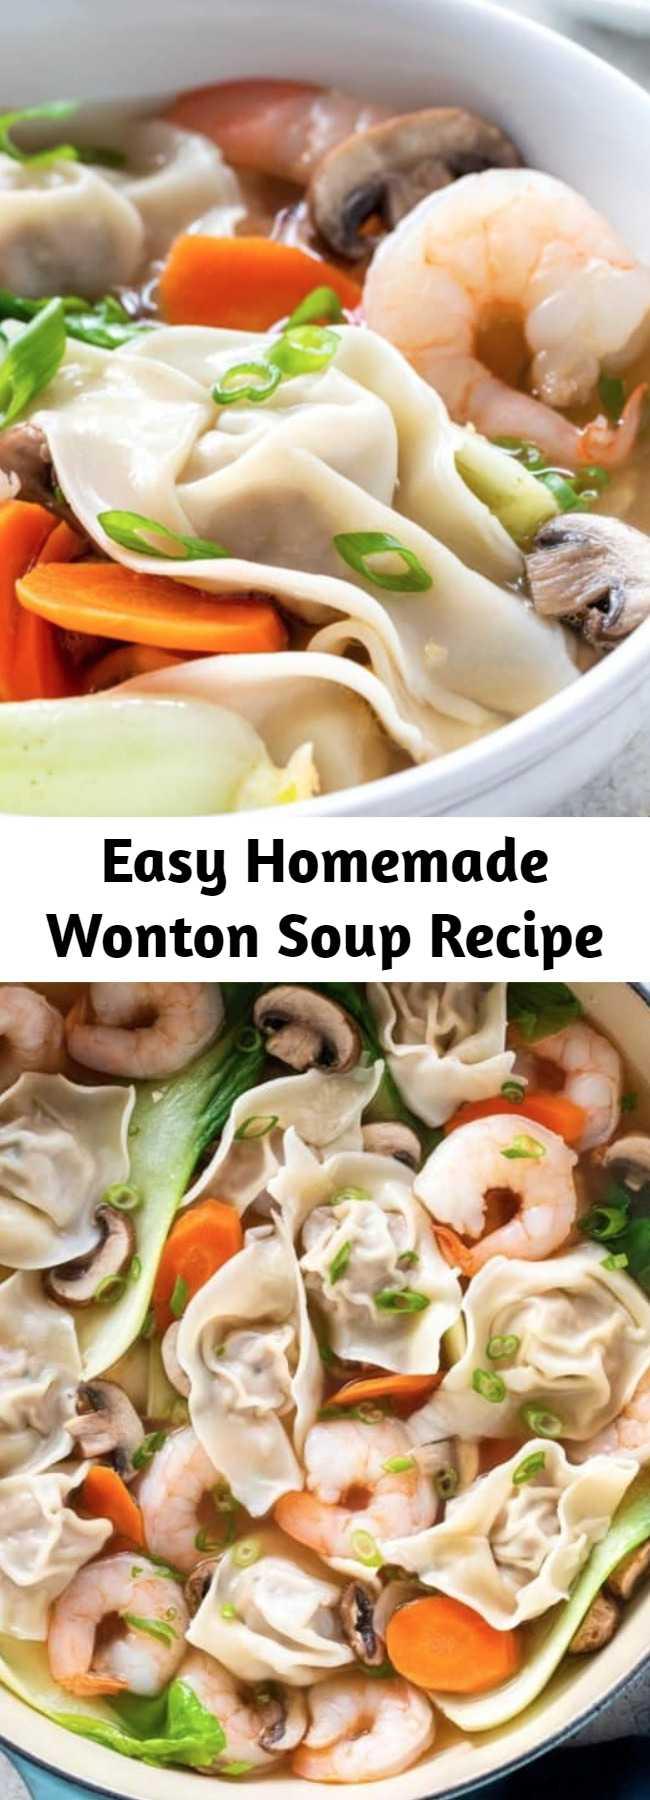 Easy Homemade Wonton Soup Recipe - This authentic homemade wonton soup recipe is easy and fun to make! Each hearty bowl is packed with plump pork dumplings, fresh vegetables and jumbo shrimp. #wontonsoup #chinesefood #dumplings